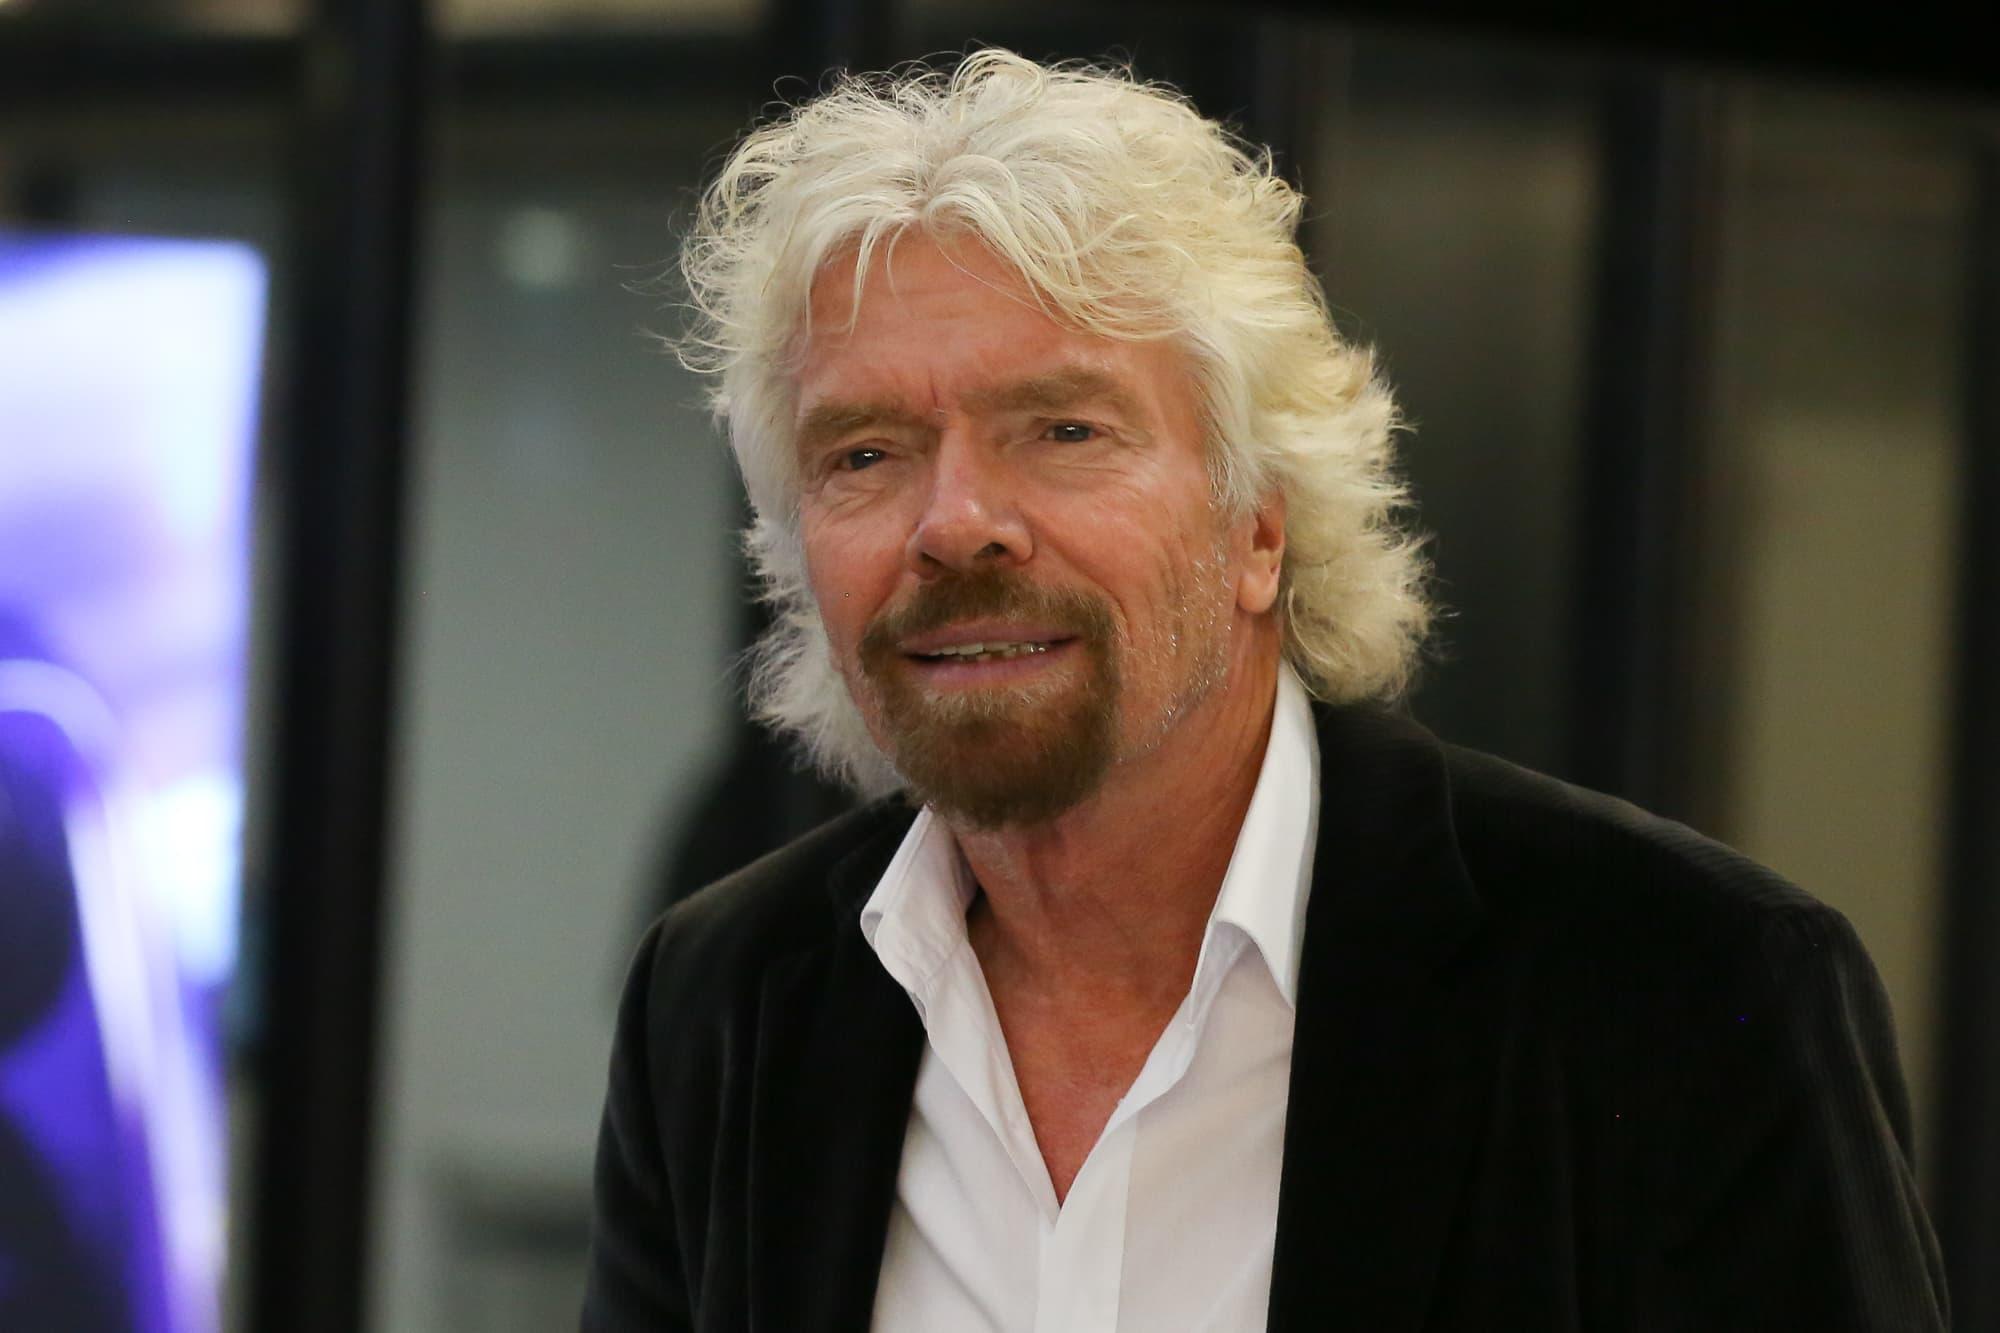 Billionaire Richard Branson's top tips for success